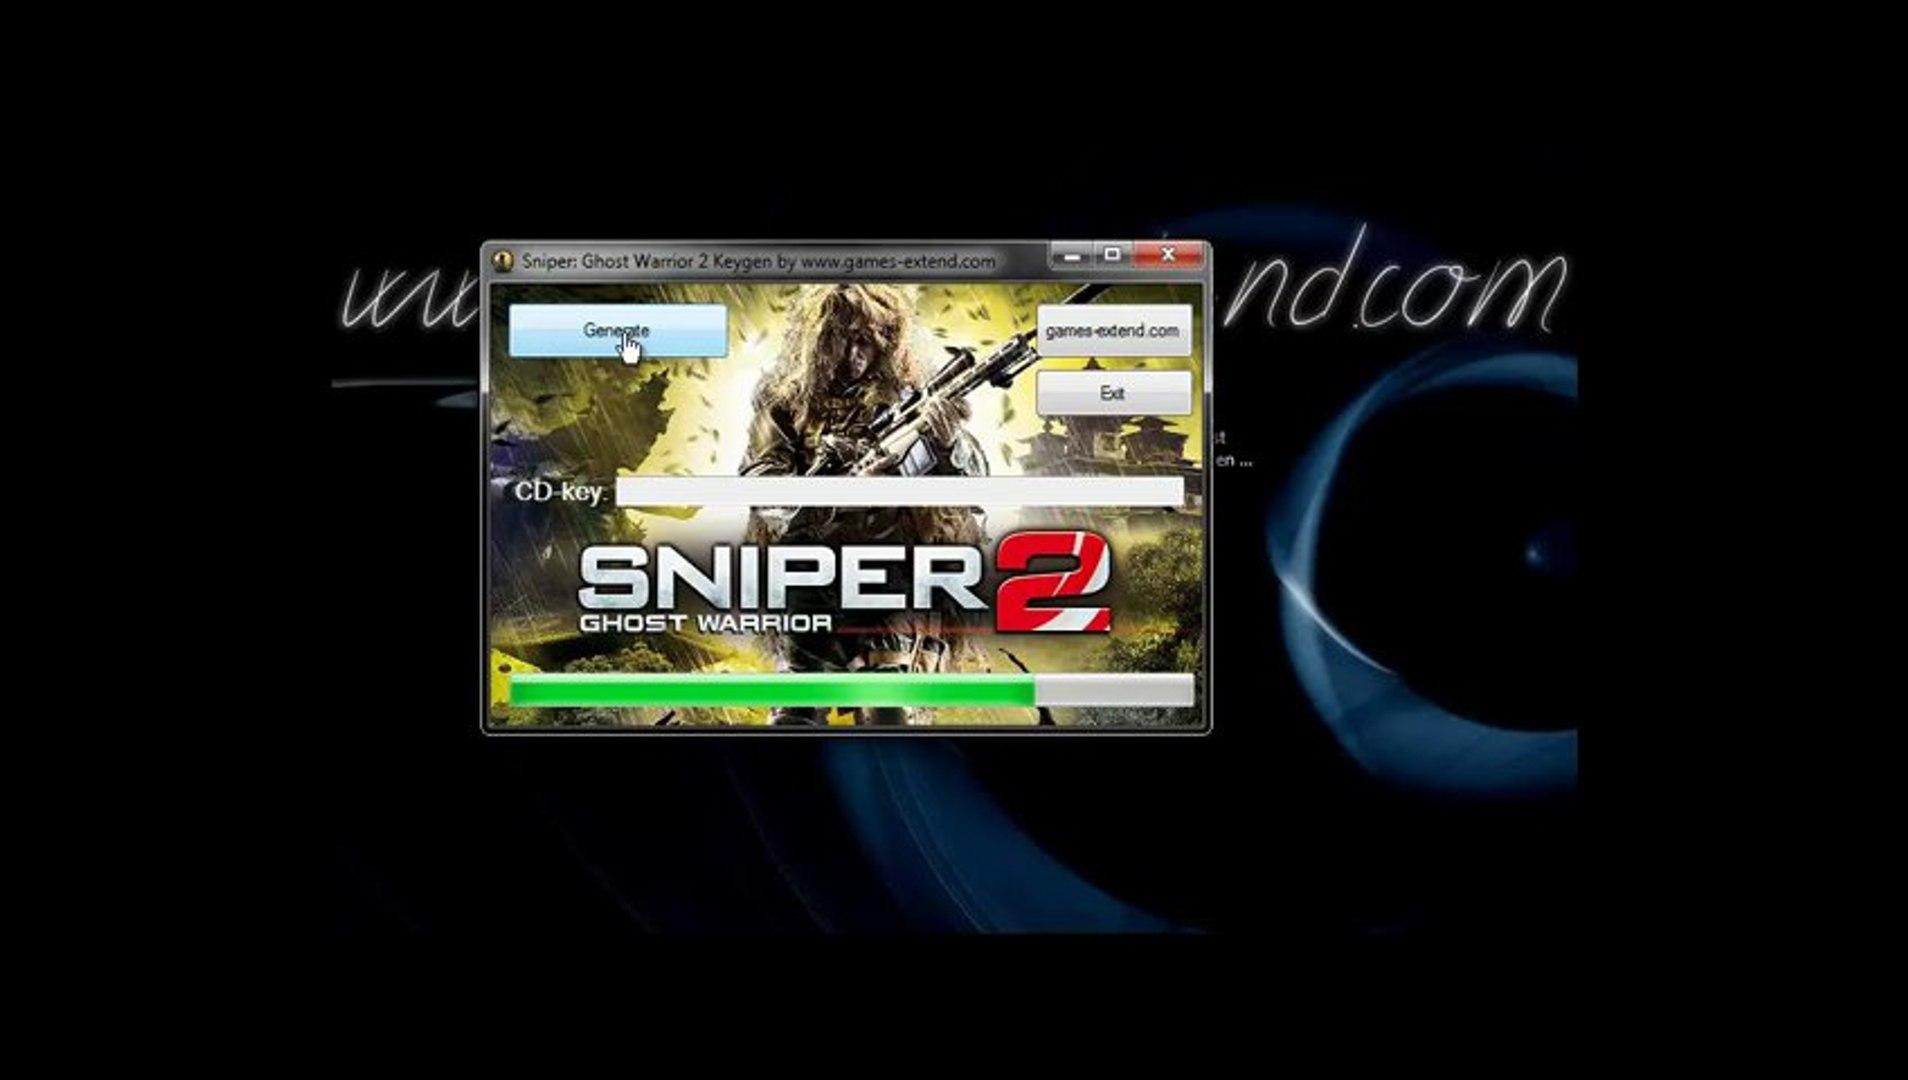 sniper ghost warrior serial number free download